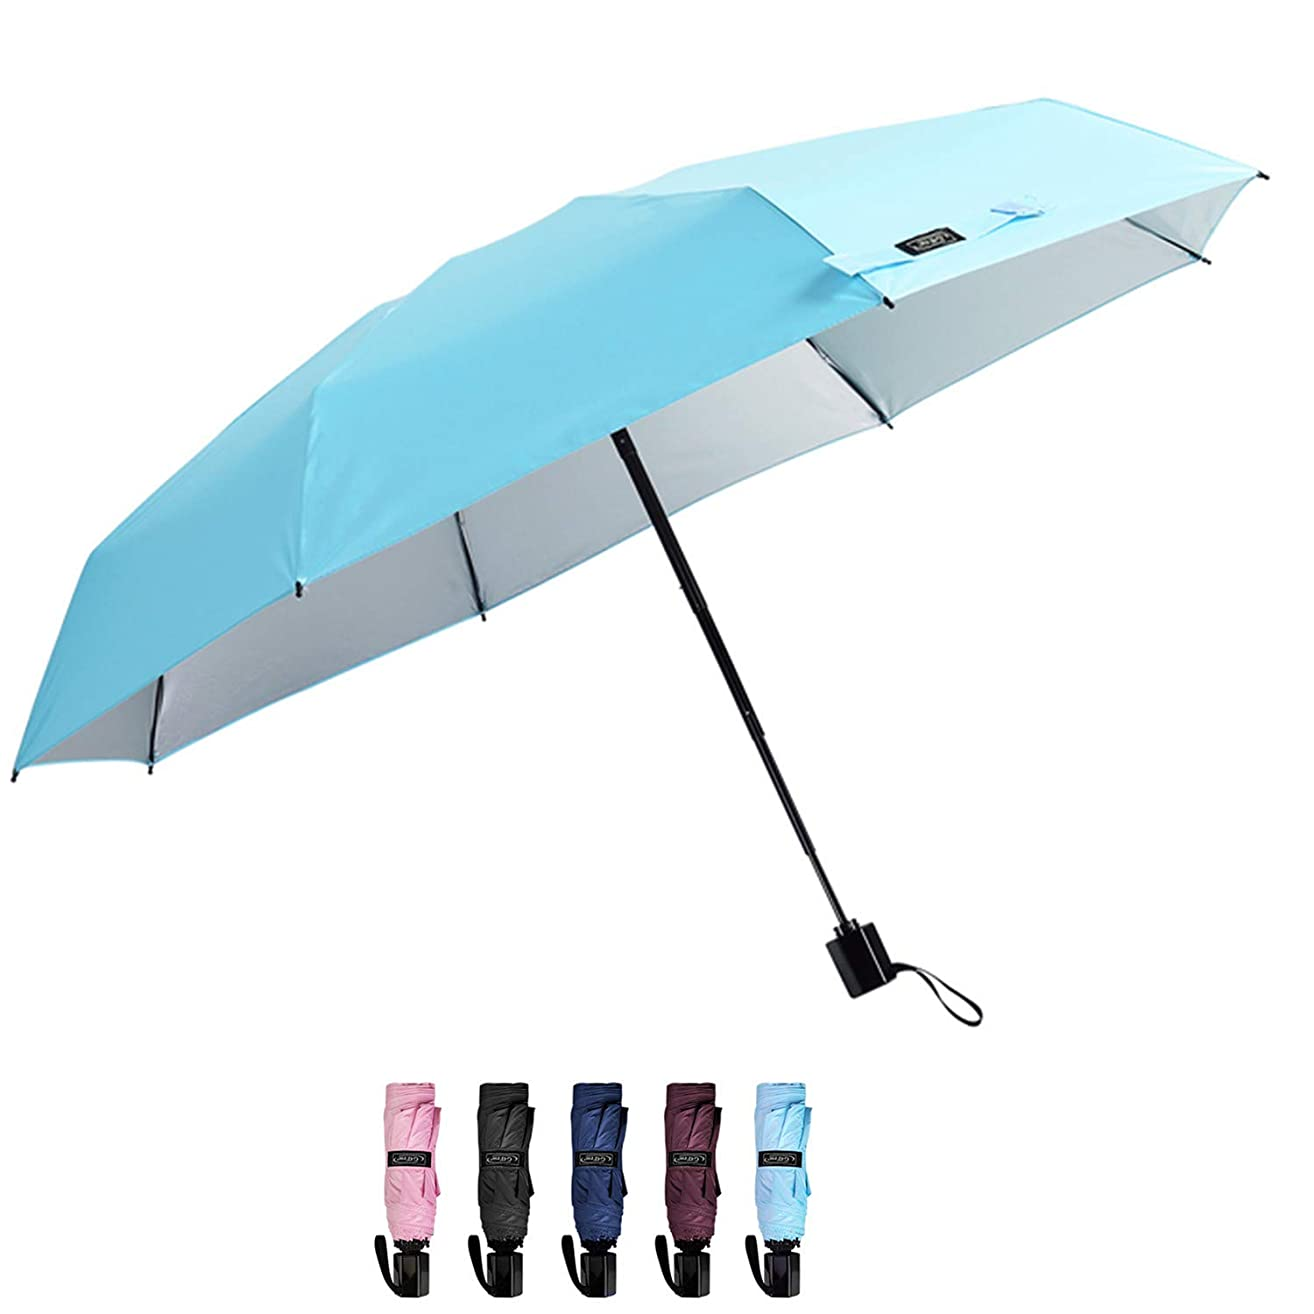 G4Free Compact Mini Travel Umbrella UV Protection Sun & Rain Collapsible Umbrella Windproof Lightweight Folding Umbrella for Men Women Kids